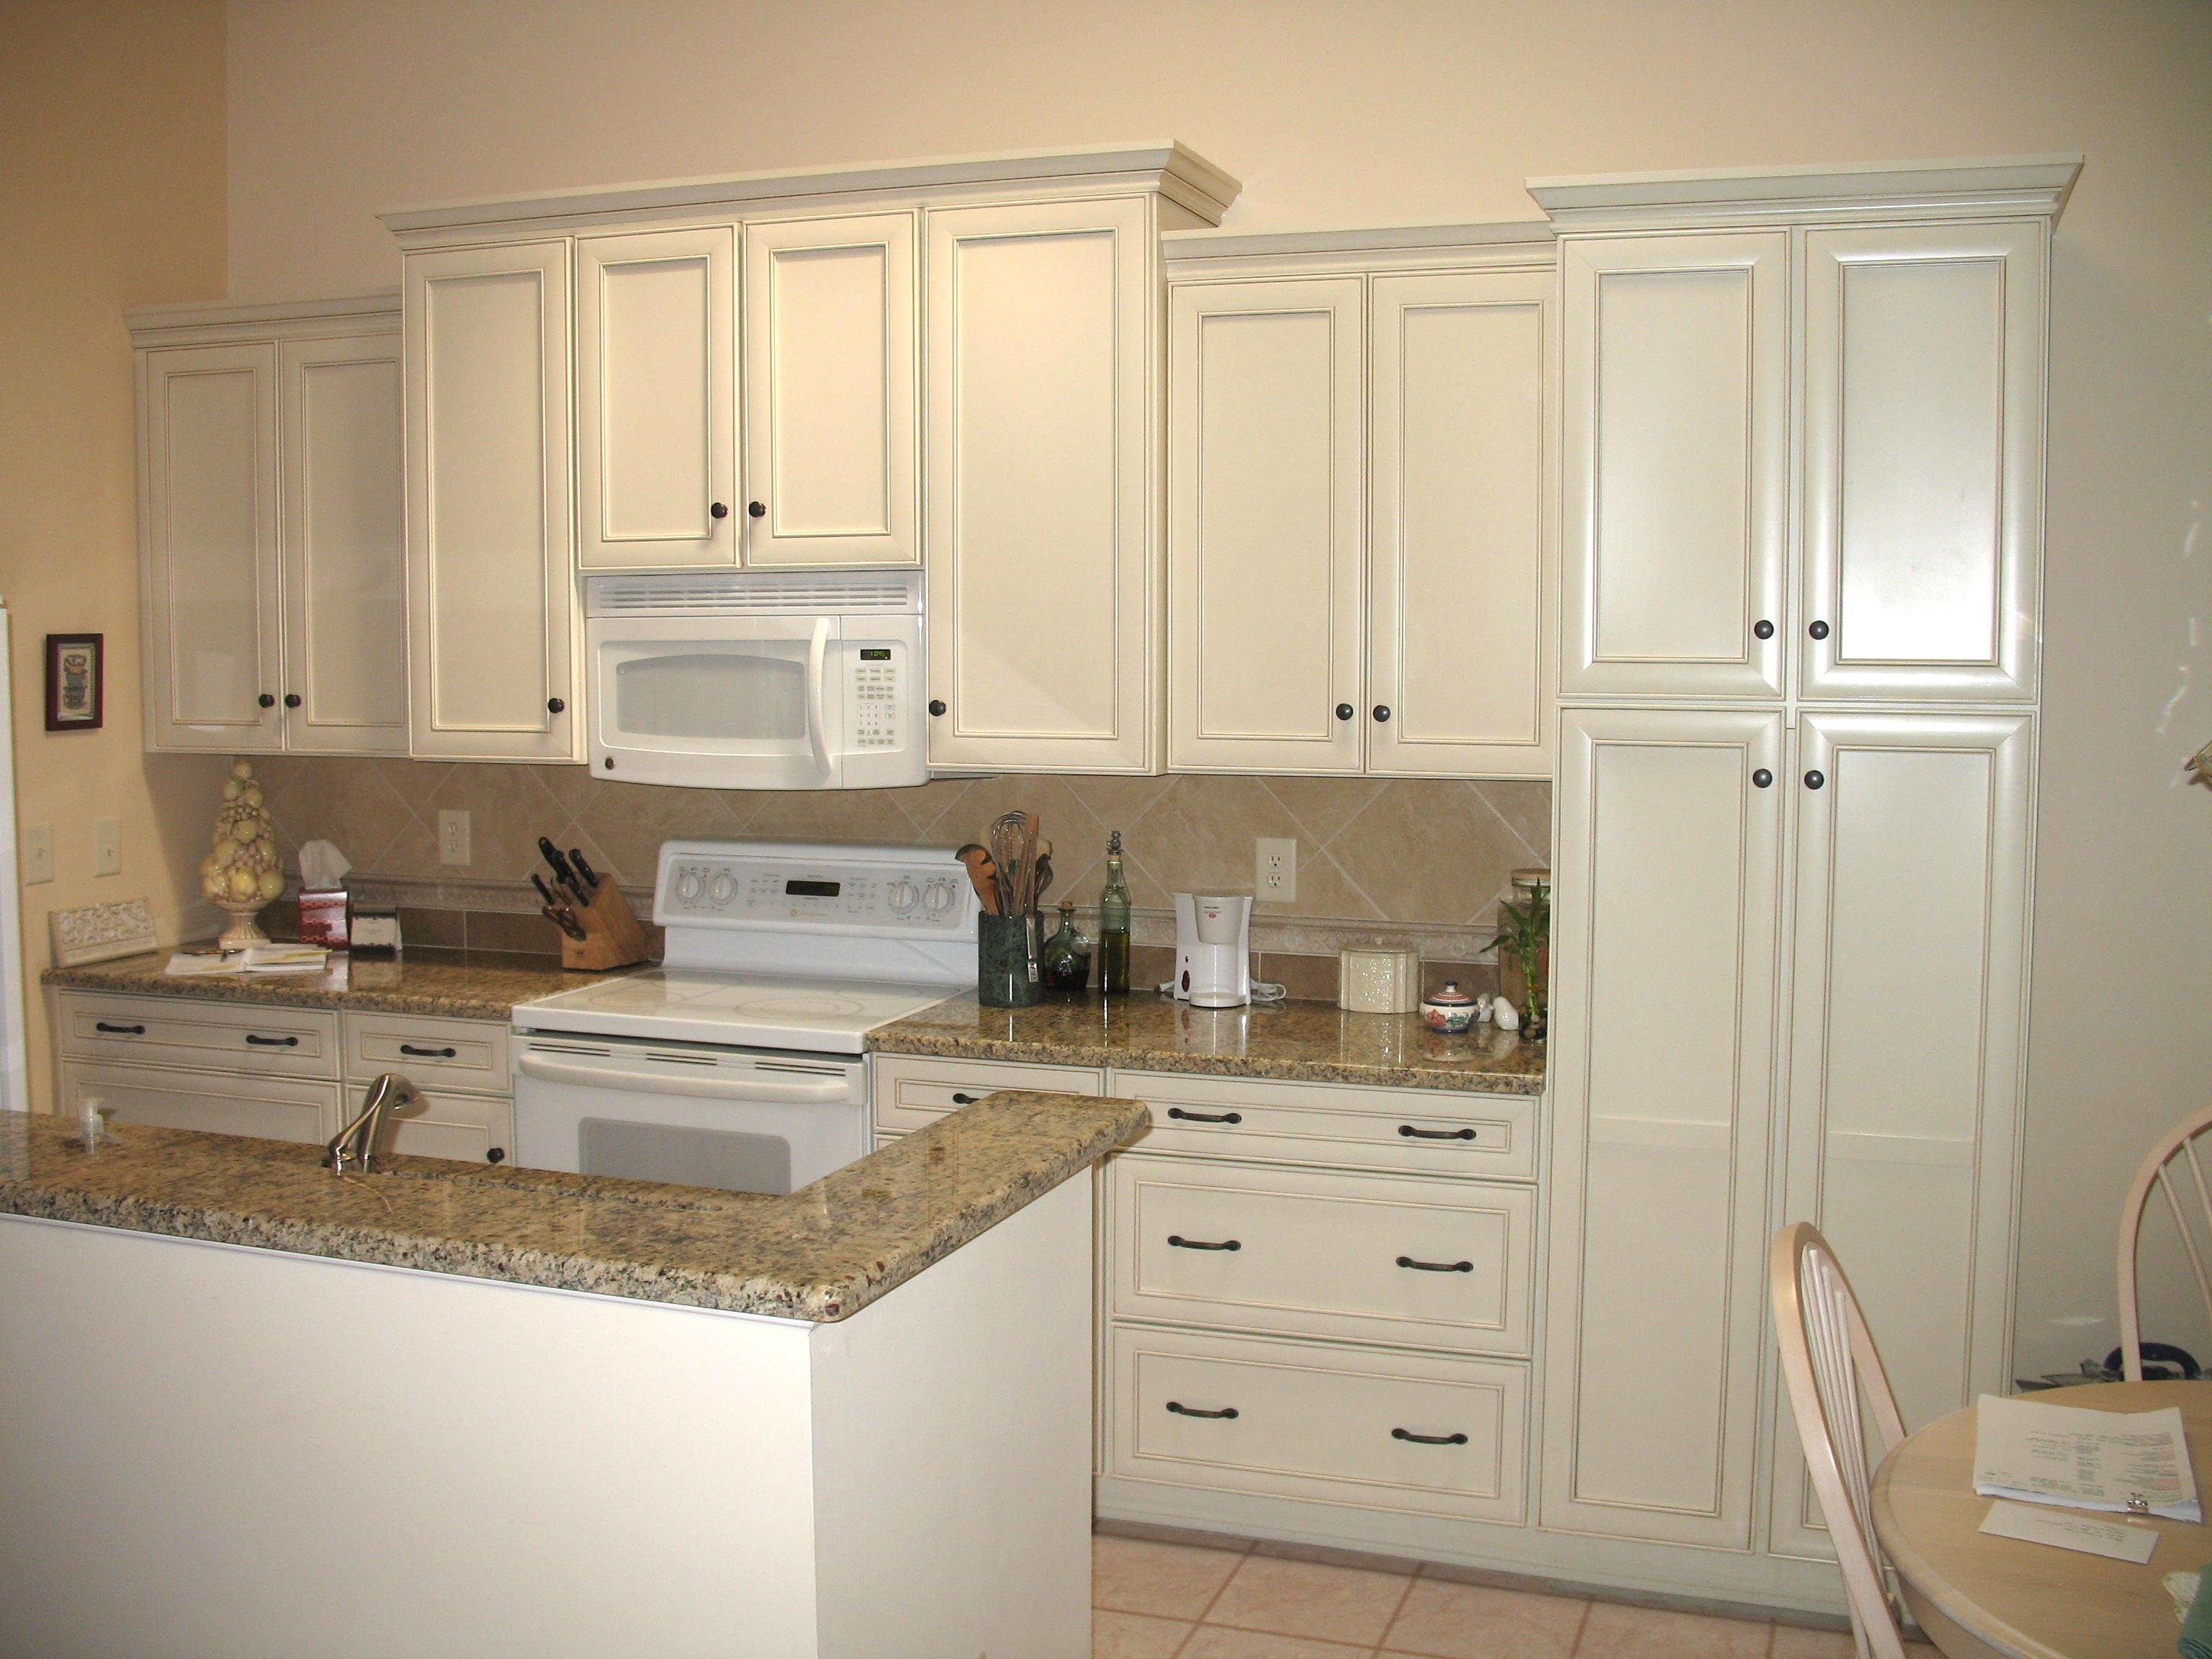 Leverette Palm Harbor Home Design Center